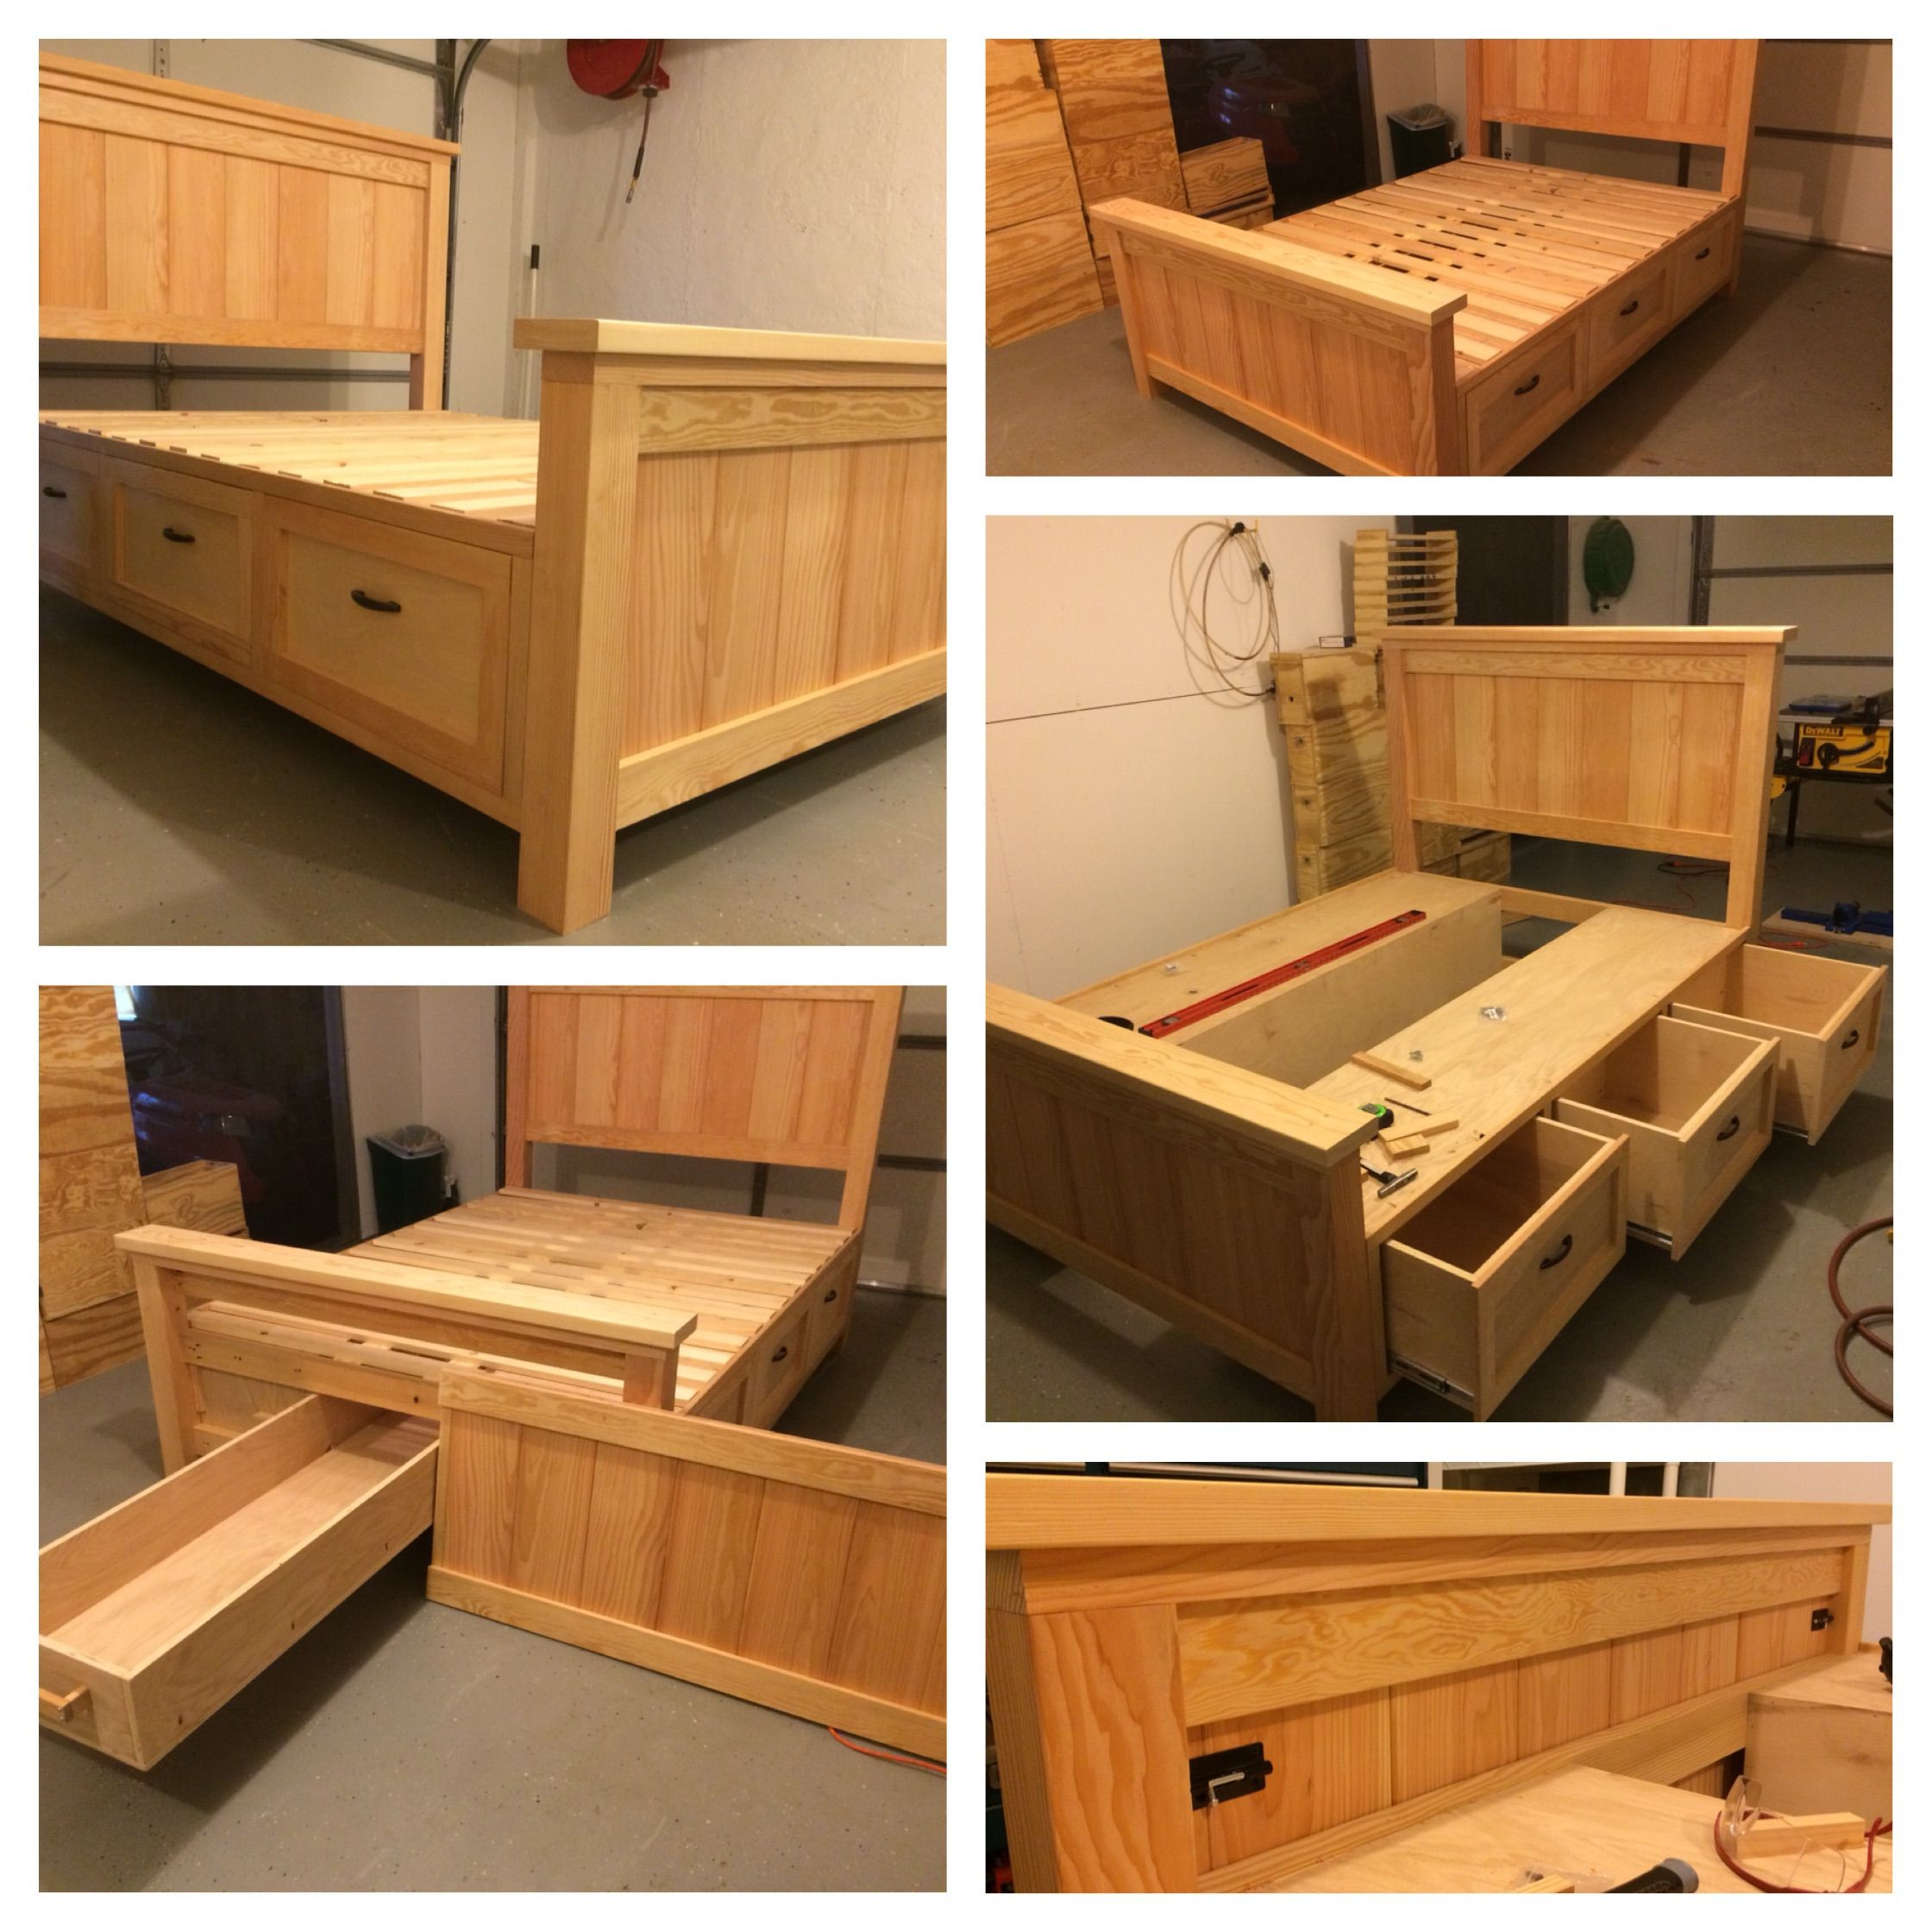 DIY Wooden Bed Frame With Storage  Download Original